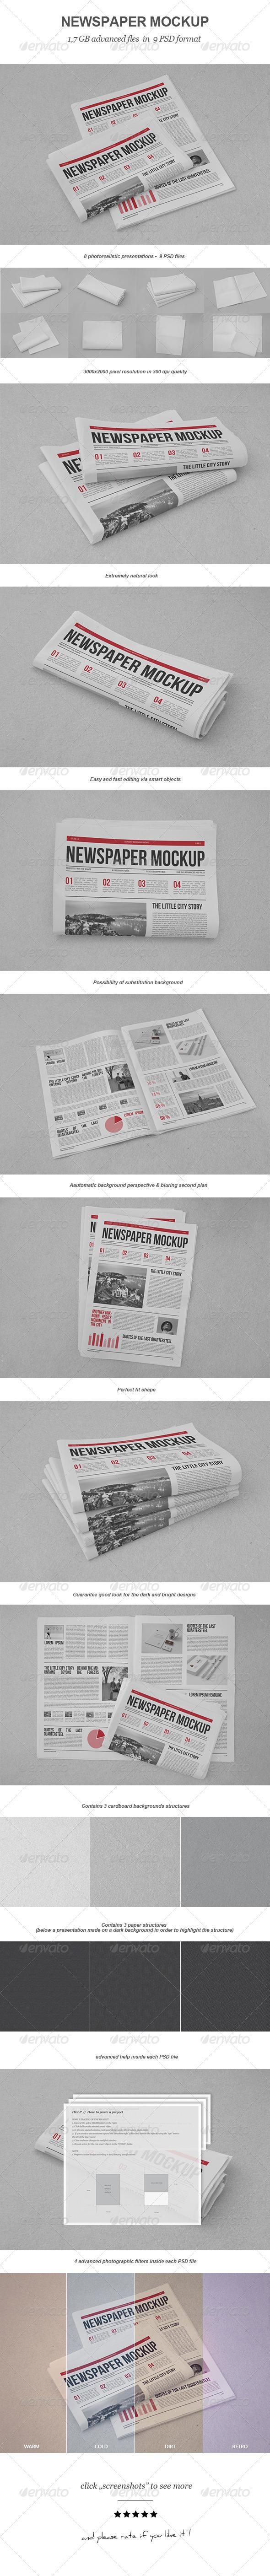 GraphicRiver Newspaper Mock-up 7424162